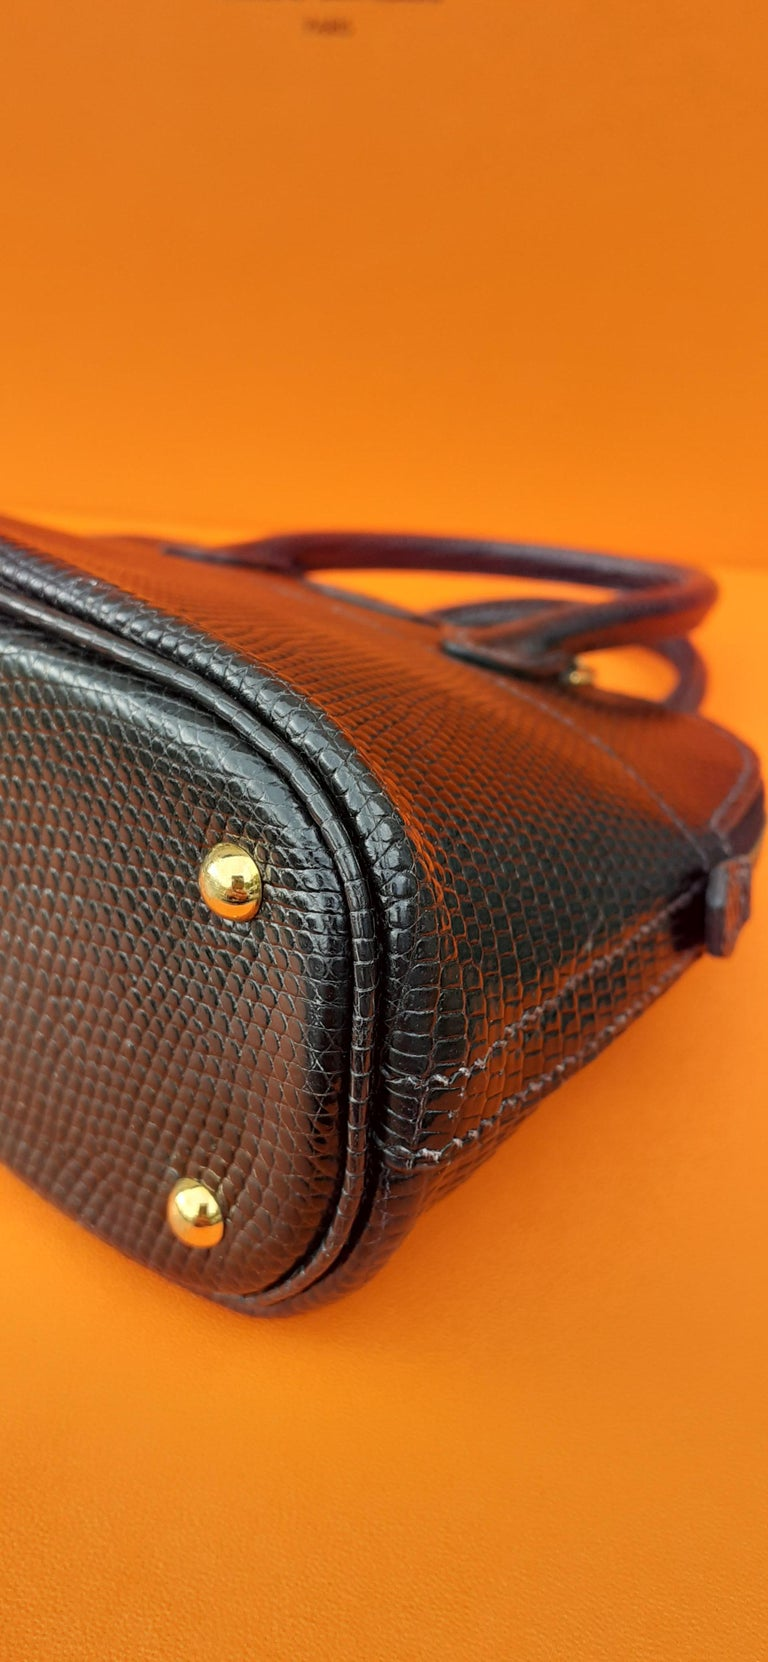 Exceptional Hermès Micro Bolide Bag Black Lizard Golden Hdw 16 cm RARE For Sale 4